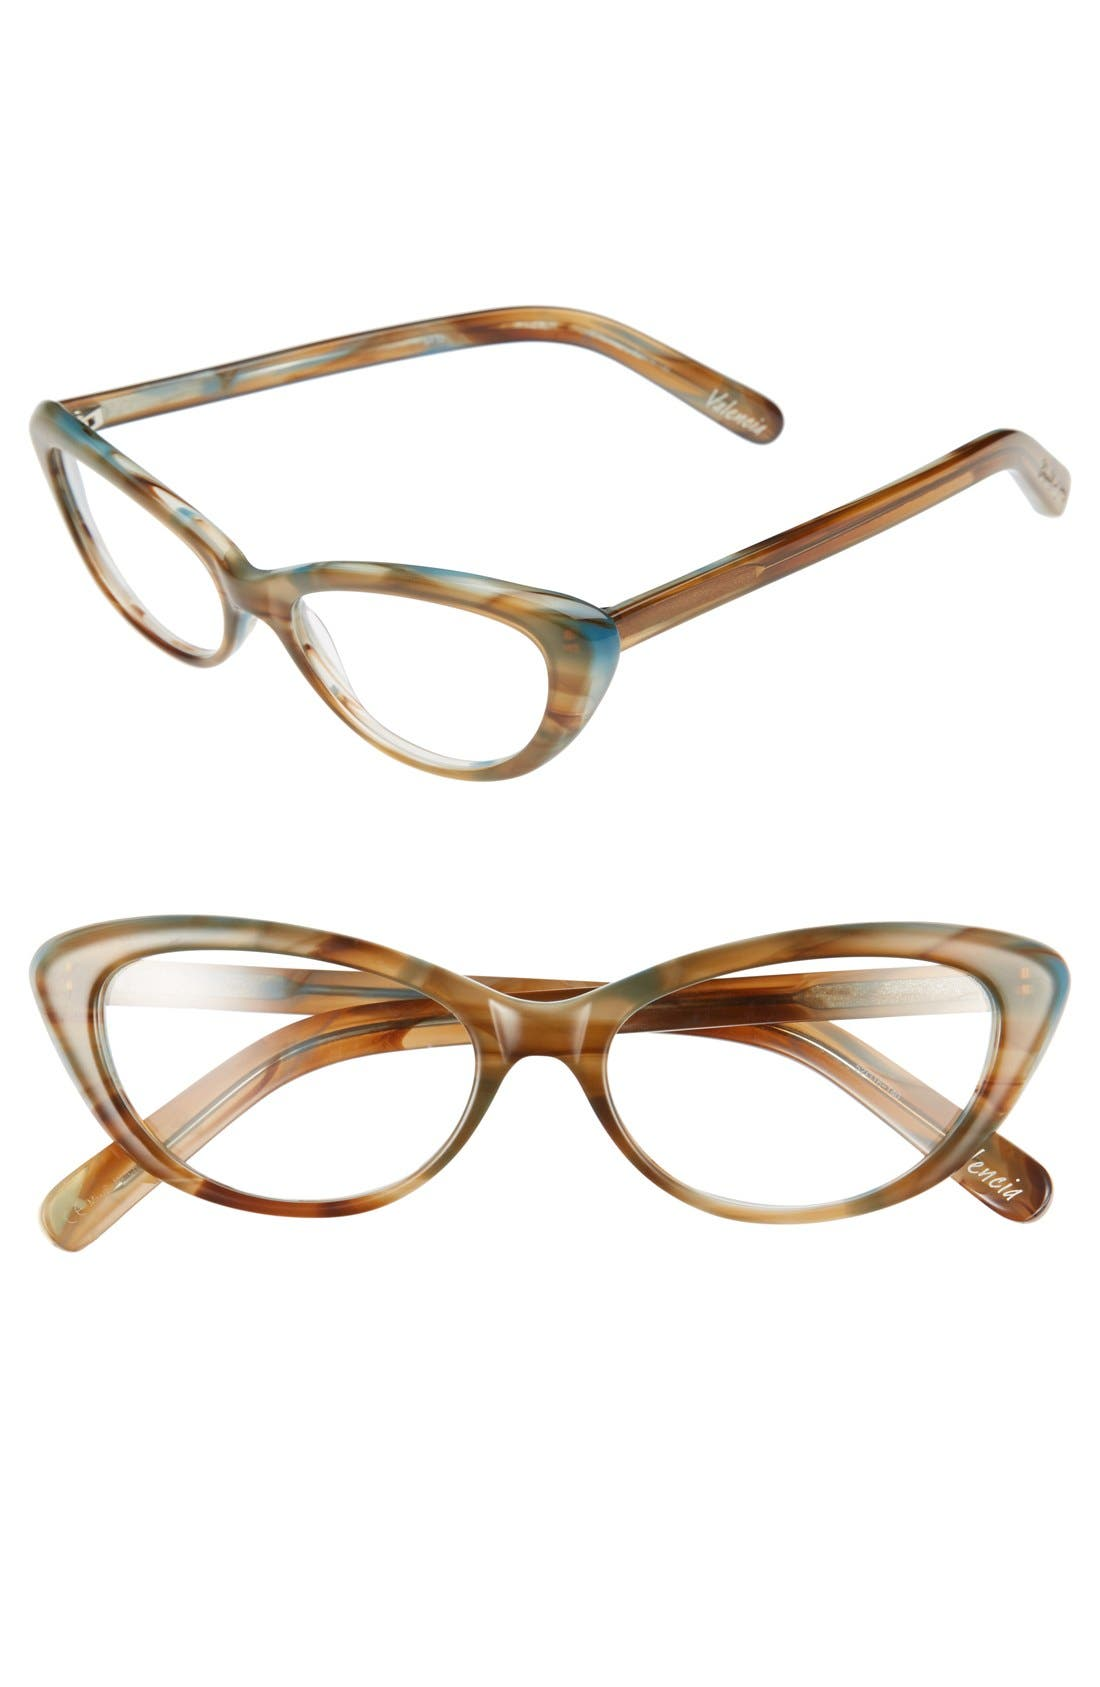 Main Image - Elizabeth and James 'Valencia' 52mm Optical Glasses